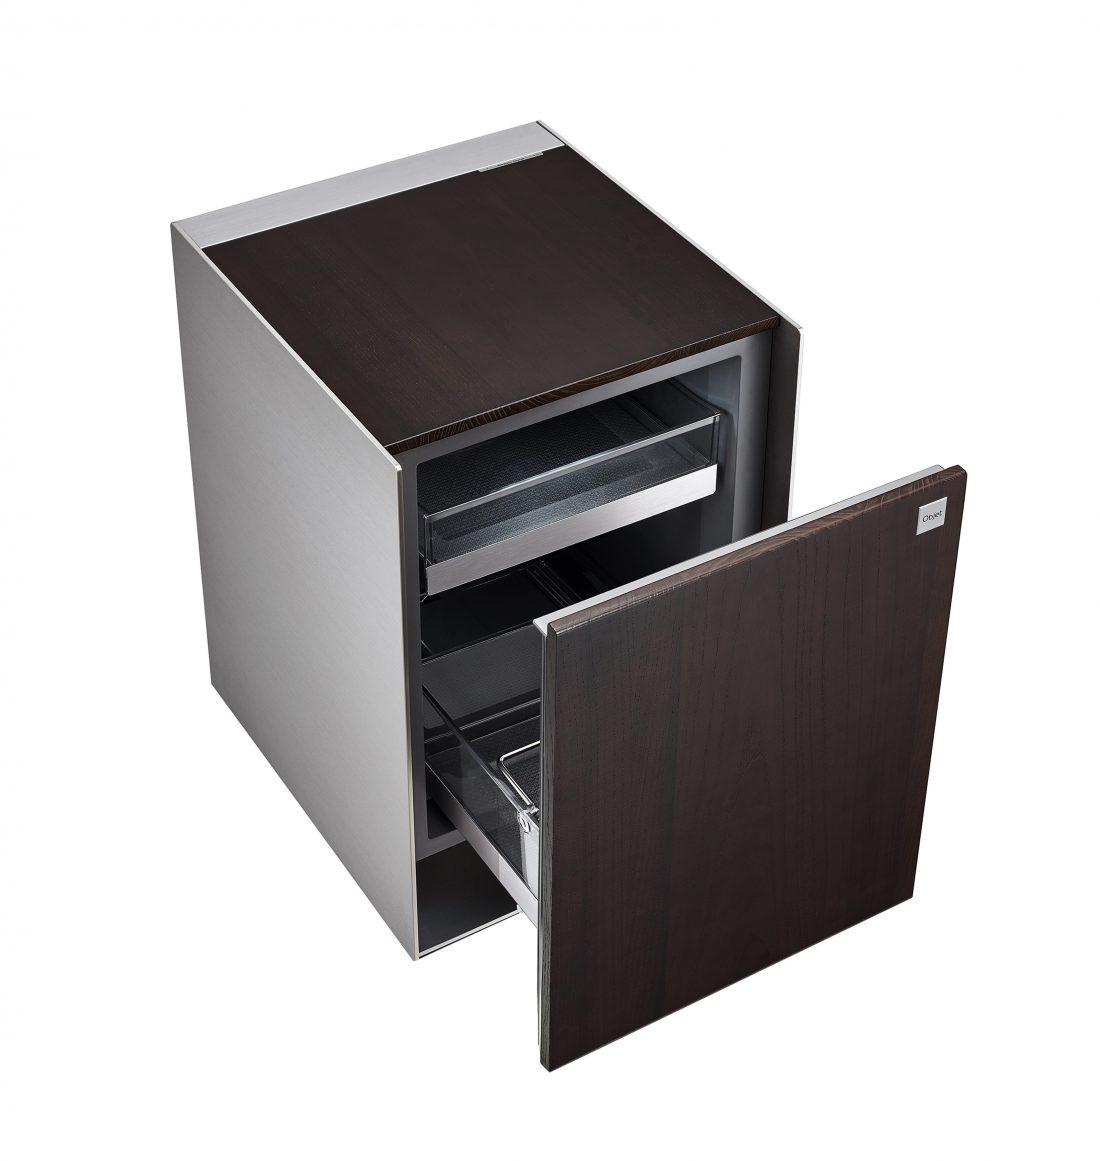 View of an empty LG OBJET Refrigerator with door open